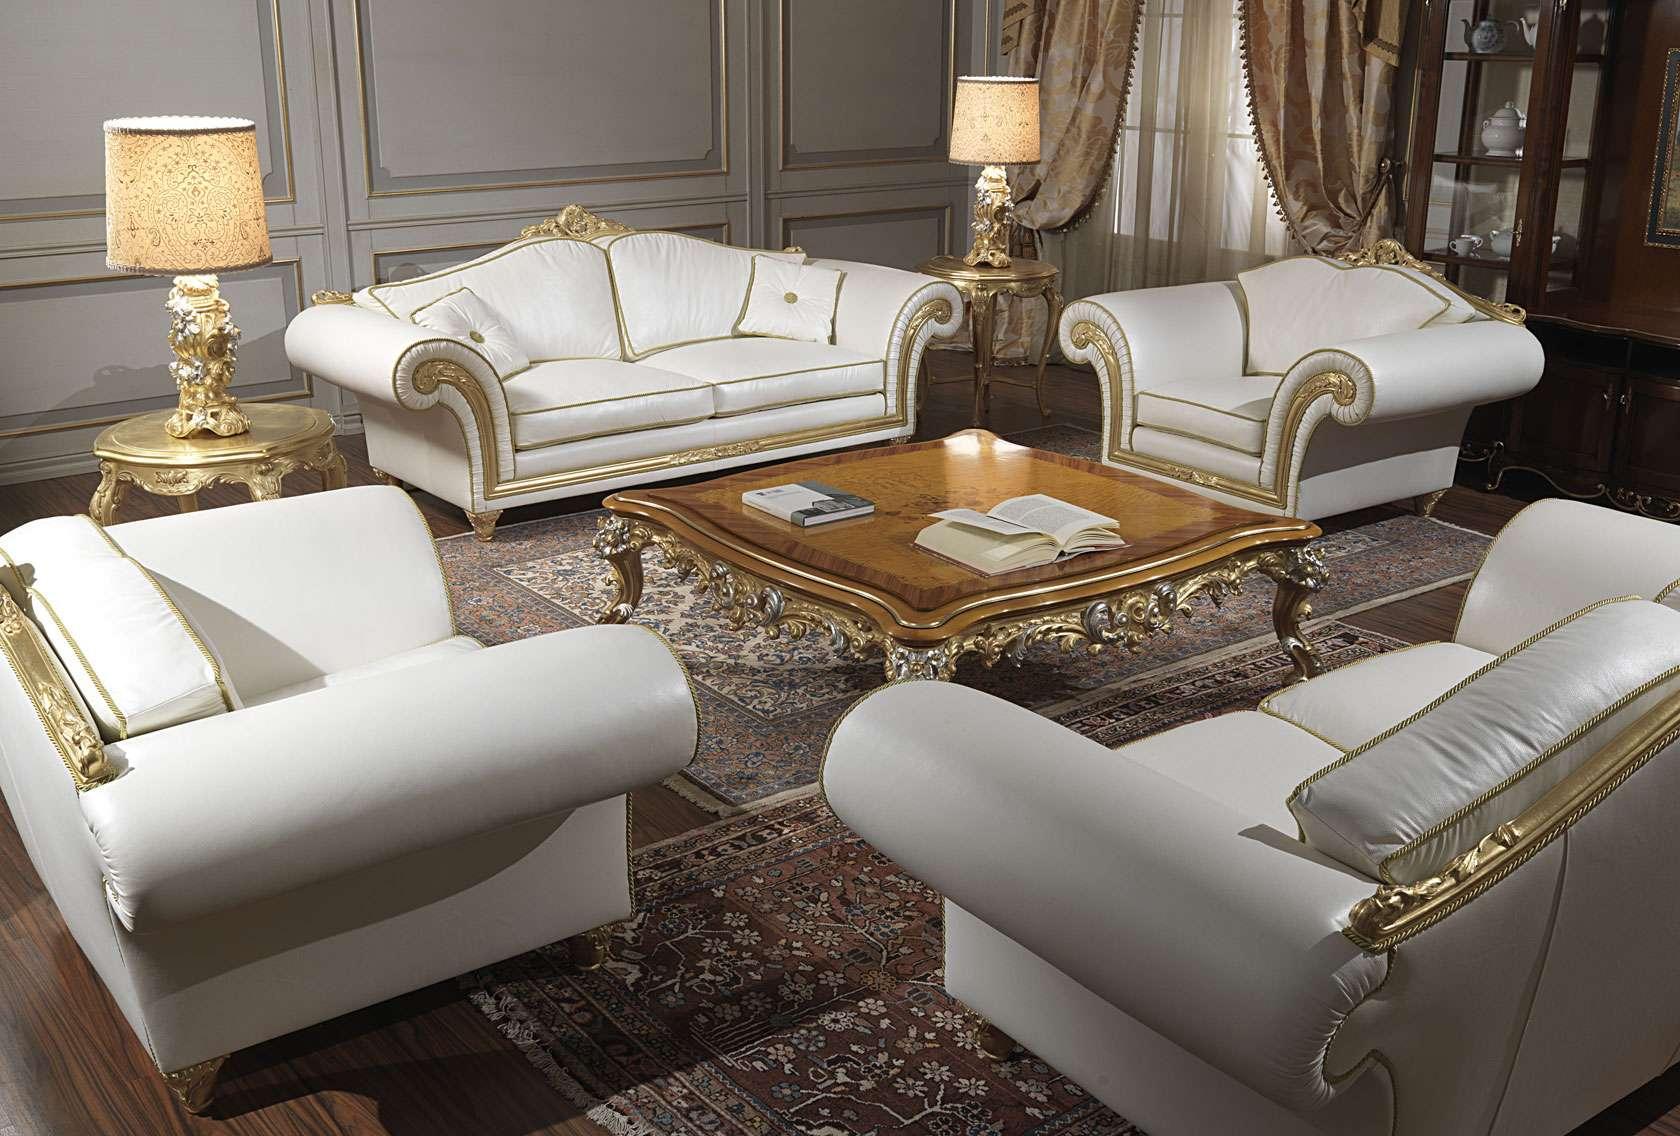 Salotto Bianco In Pelle.Salotto Imperial In Pelle Bianca Vimercati Meda